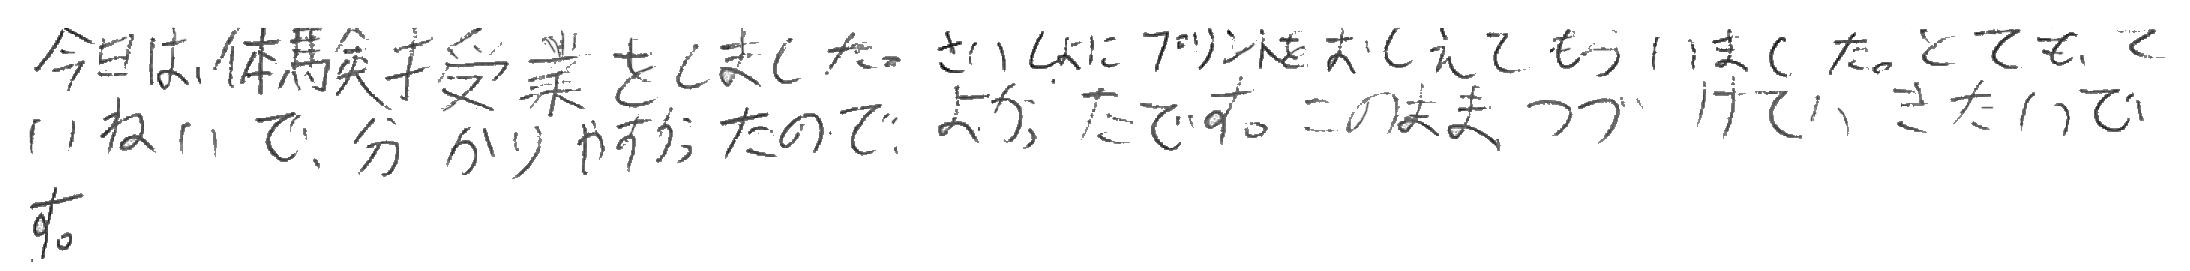 Y君(大飯郡おおい町)からの口コミ